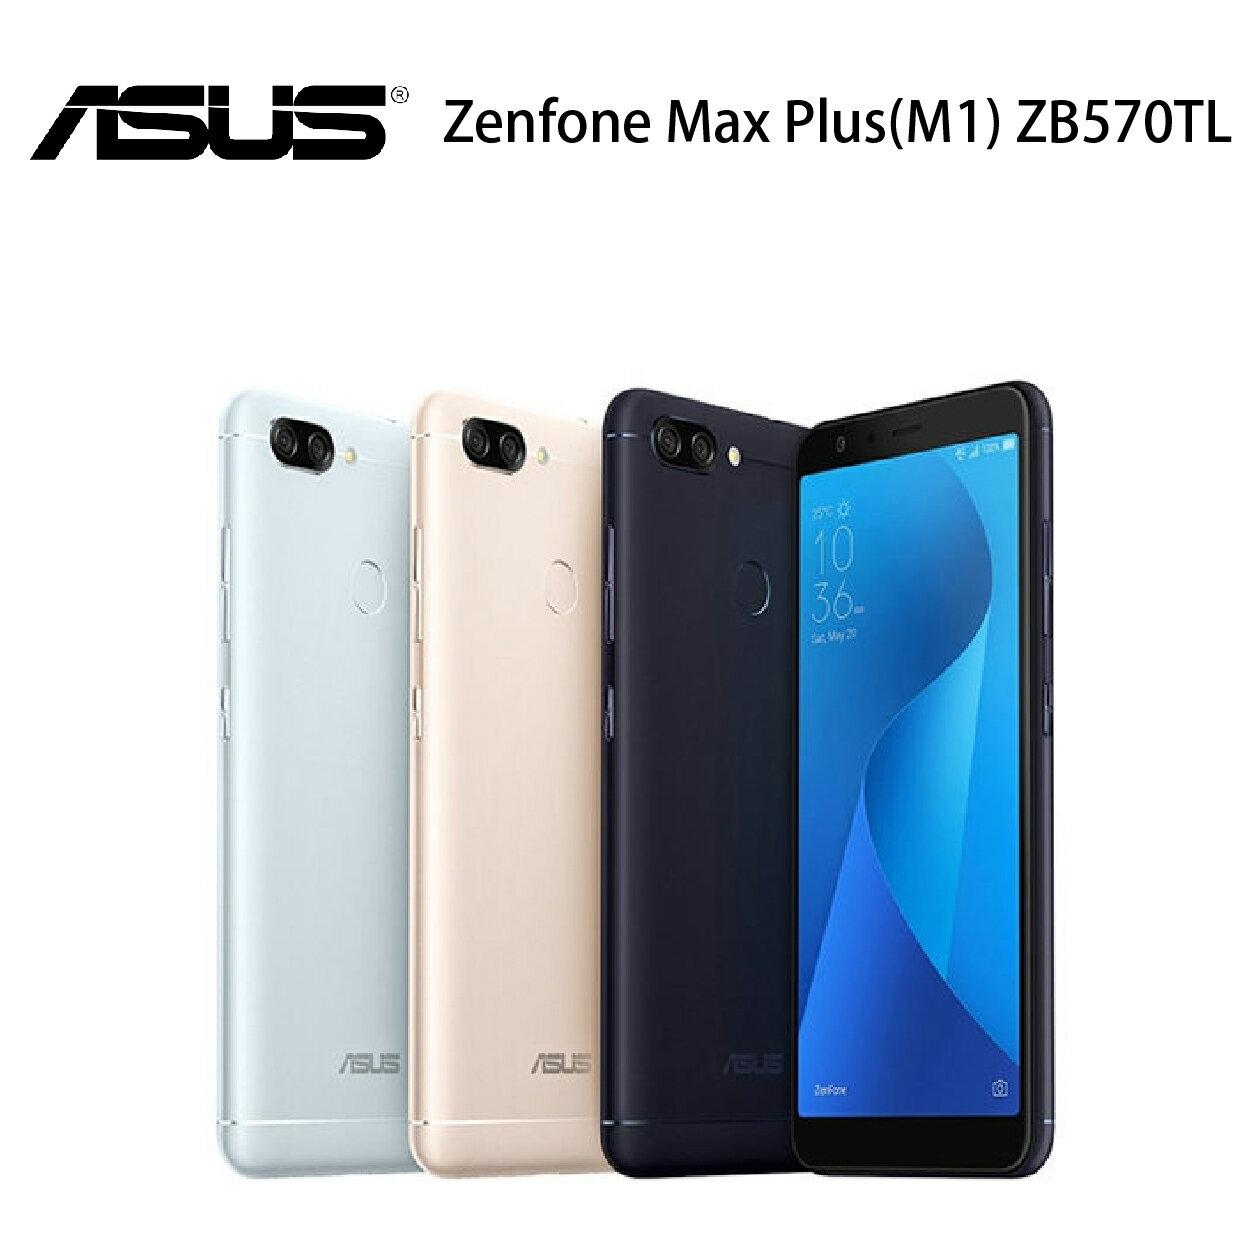 [滿萬可享12期零利率]華碩ASUS ZenFone Max Plus (M1) ZB570TL 3G/32GB 5.7吋-黑/藍/金